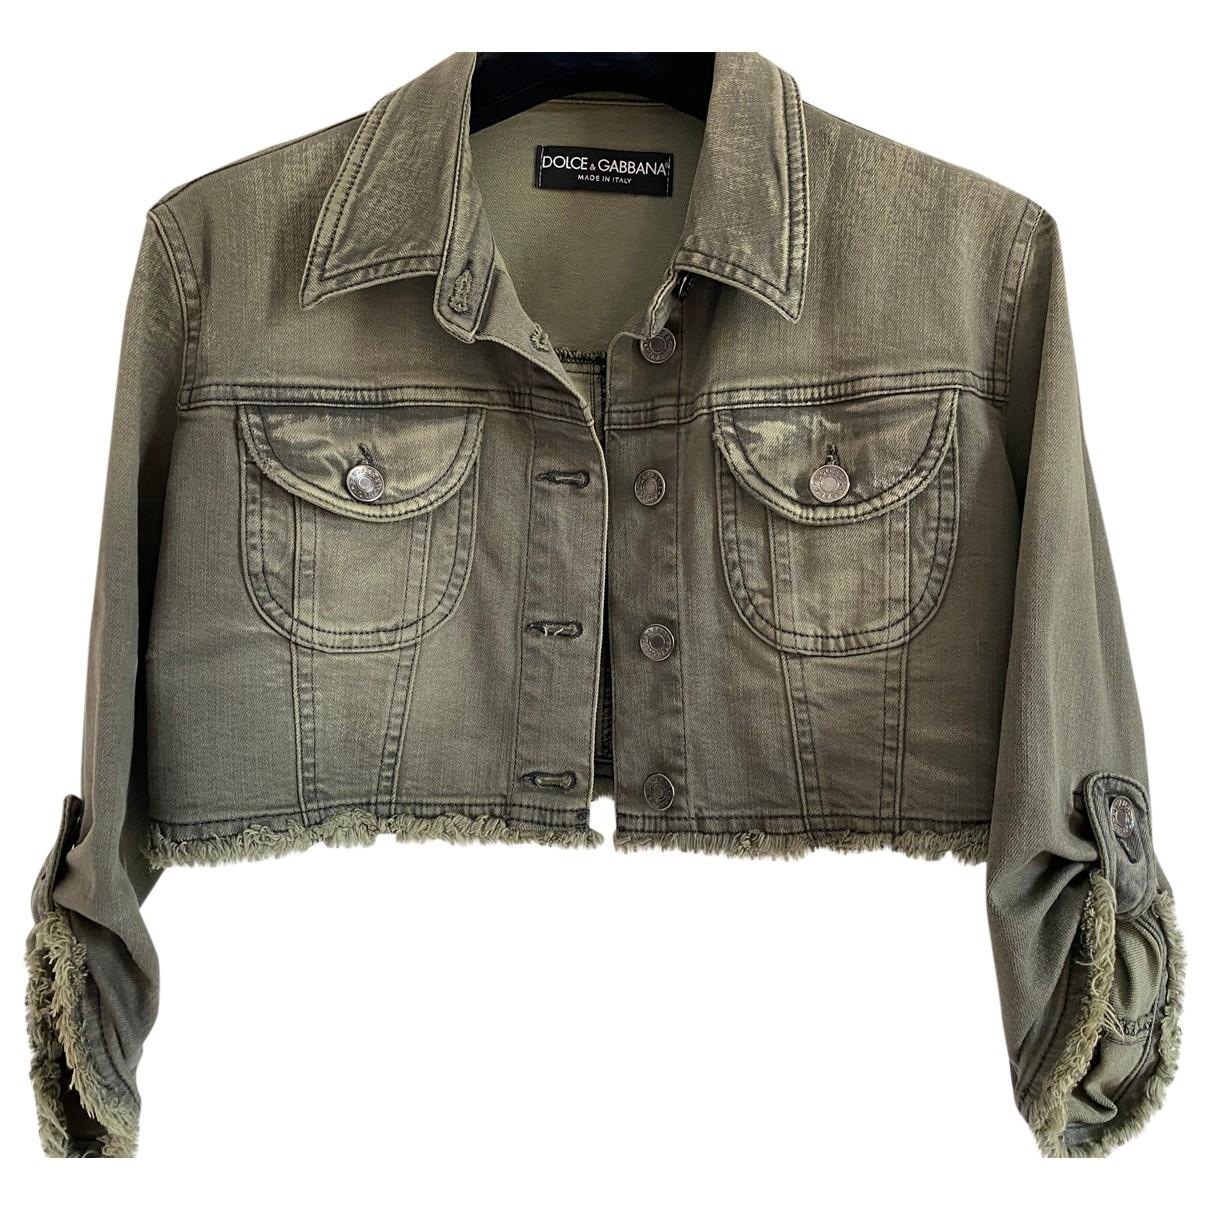 Dolce & Gabbana \N Jacke in  Gruen Denim - Jeans